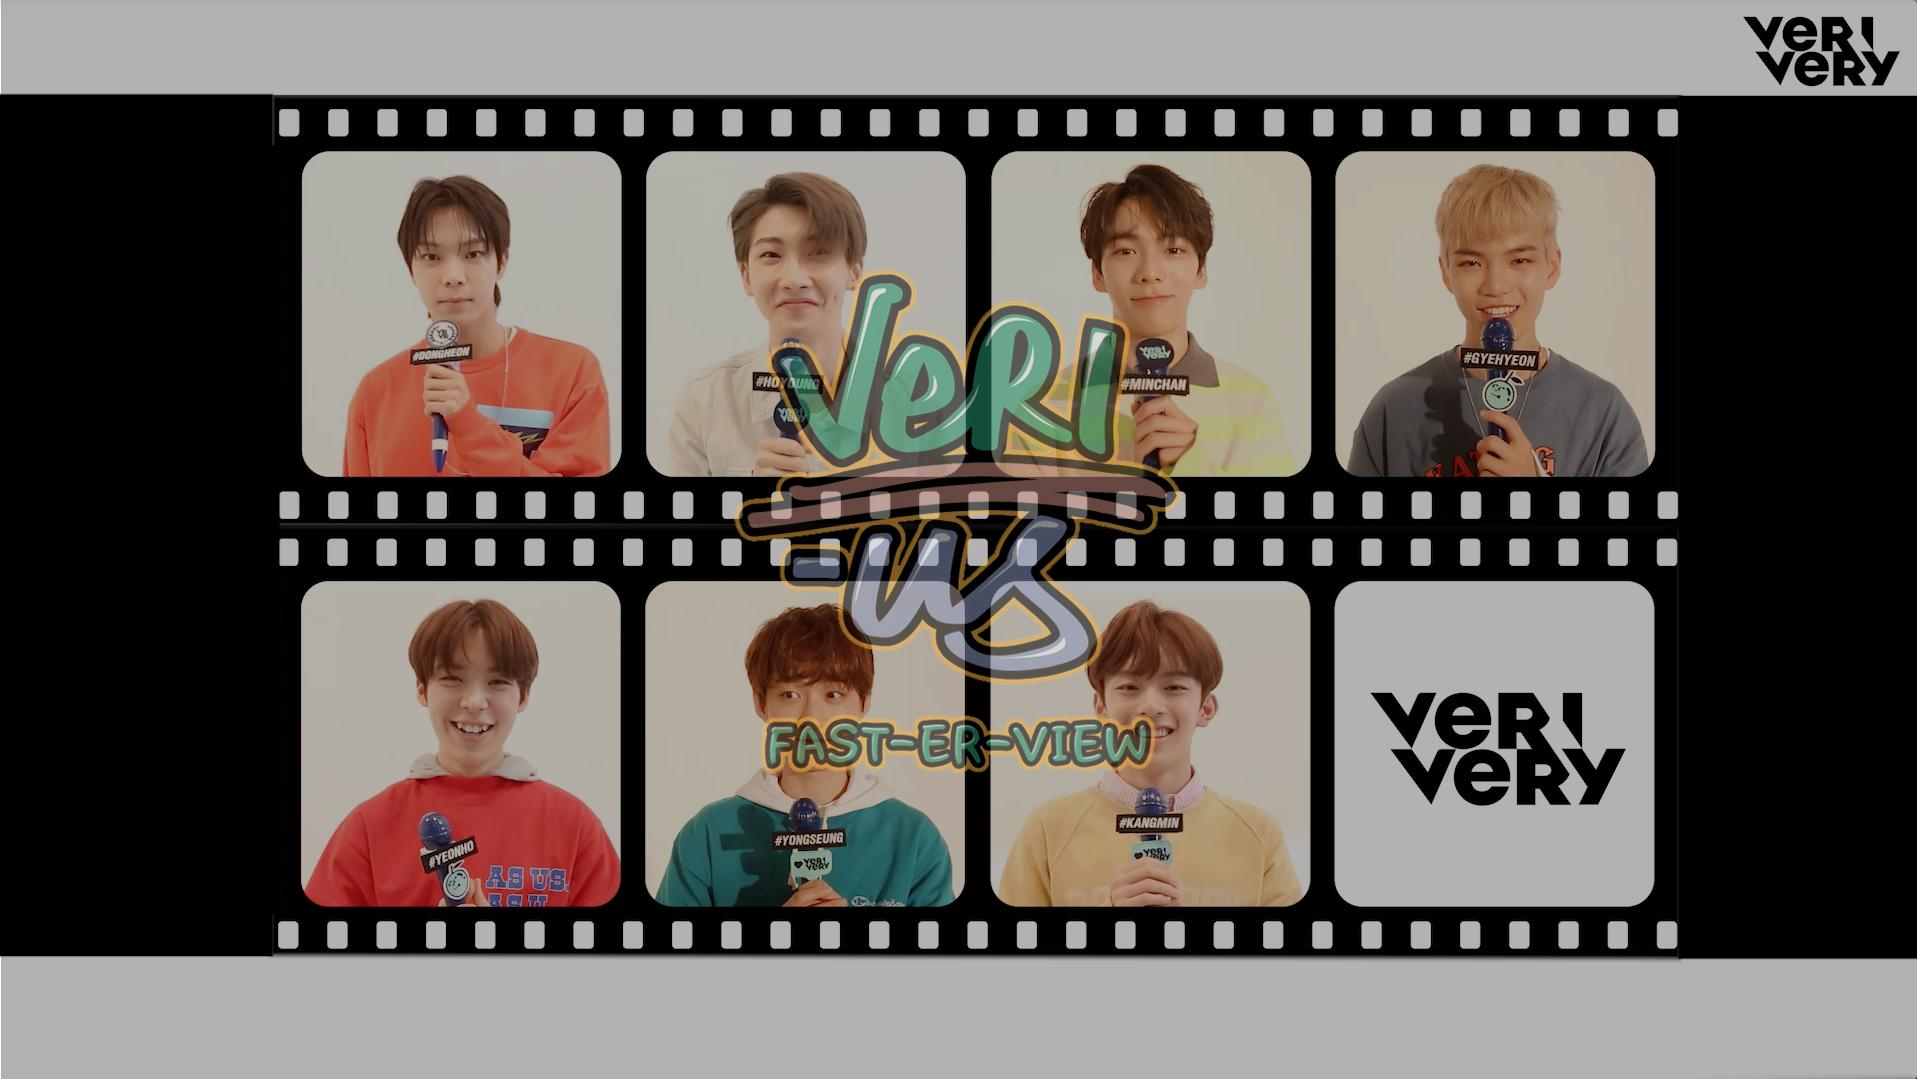 VERIVERY FAST-ER-VIEW [뮤직비디오 촬영 현장]